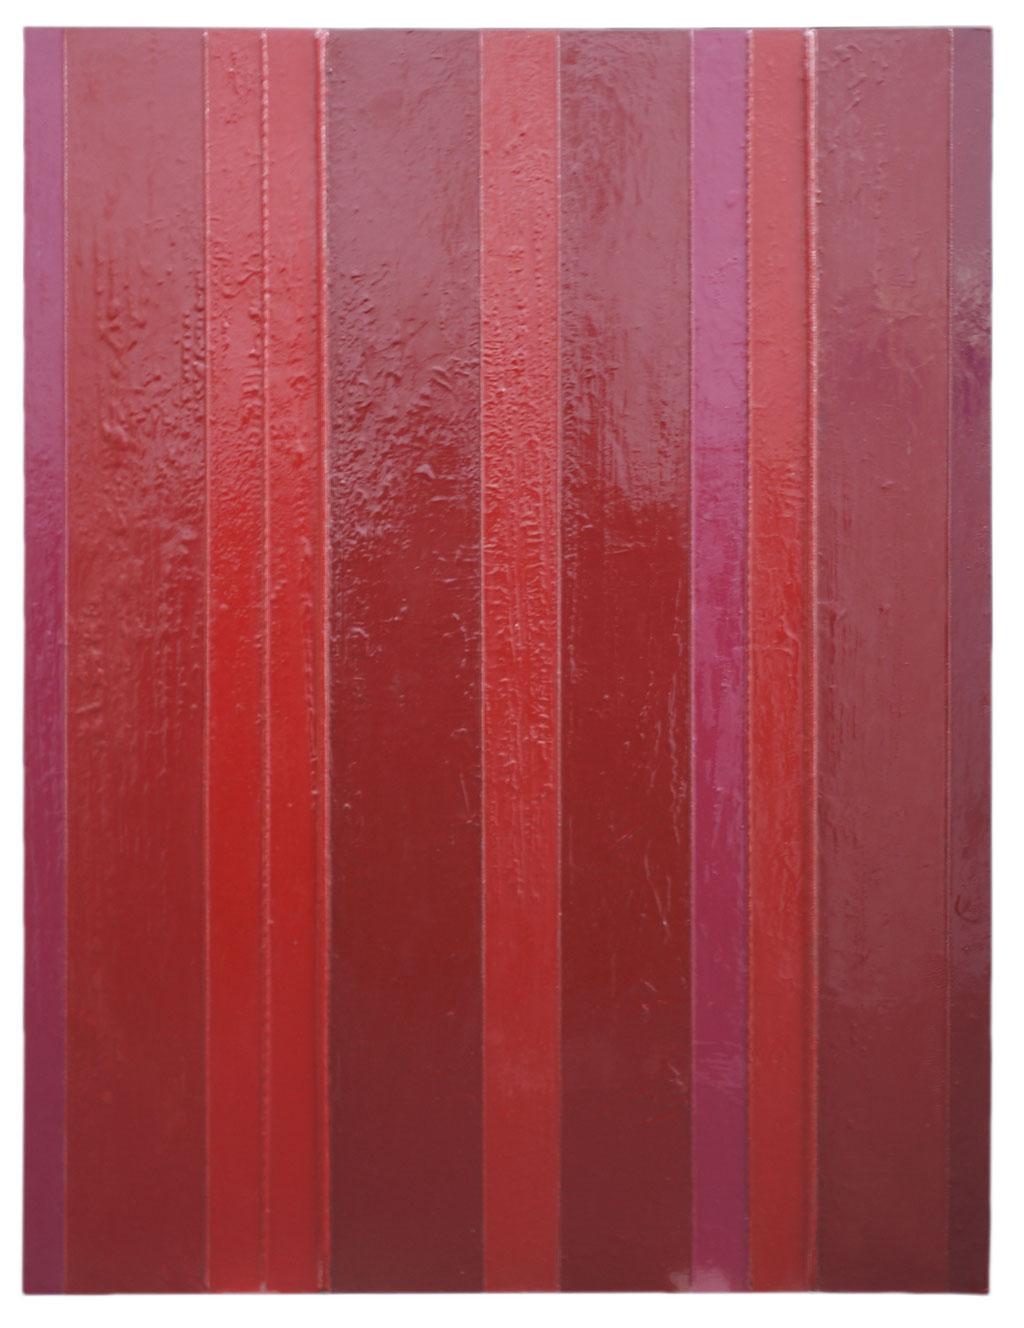 <b>Felix III, Mai 1997</b><br> 1997, Spachtel, Lack, Baumwollkordel auf Hartfaserplatte, <br>120 x 90 cm